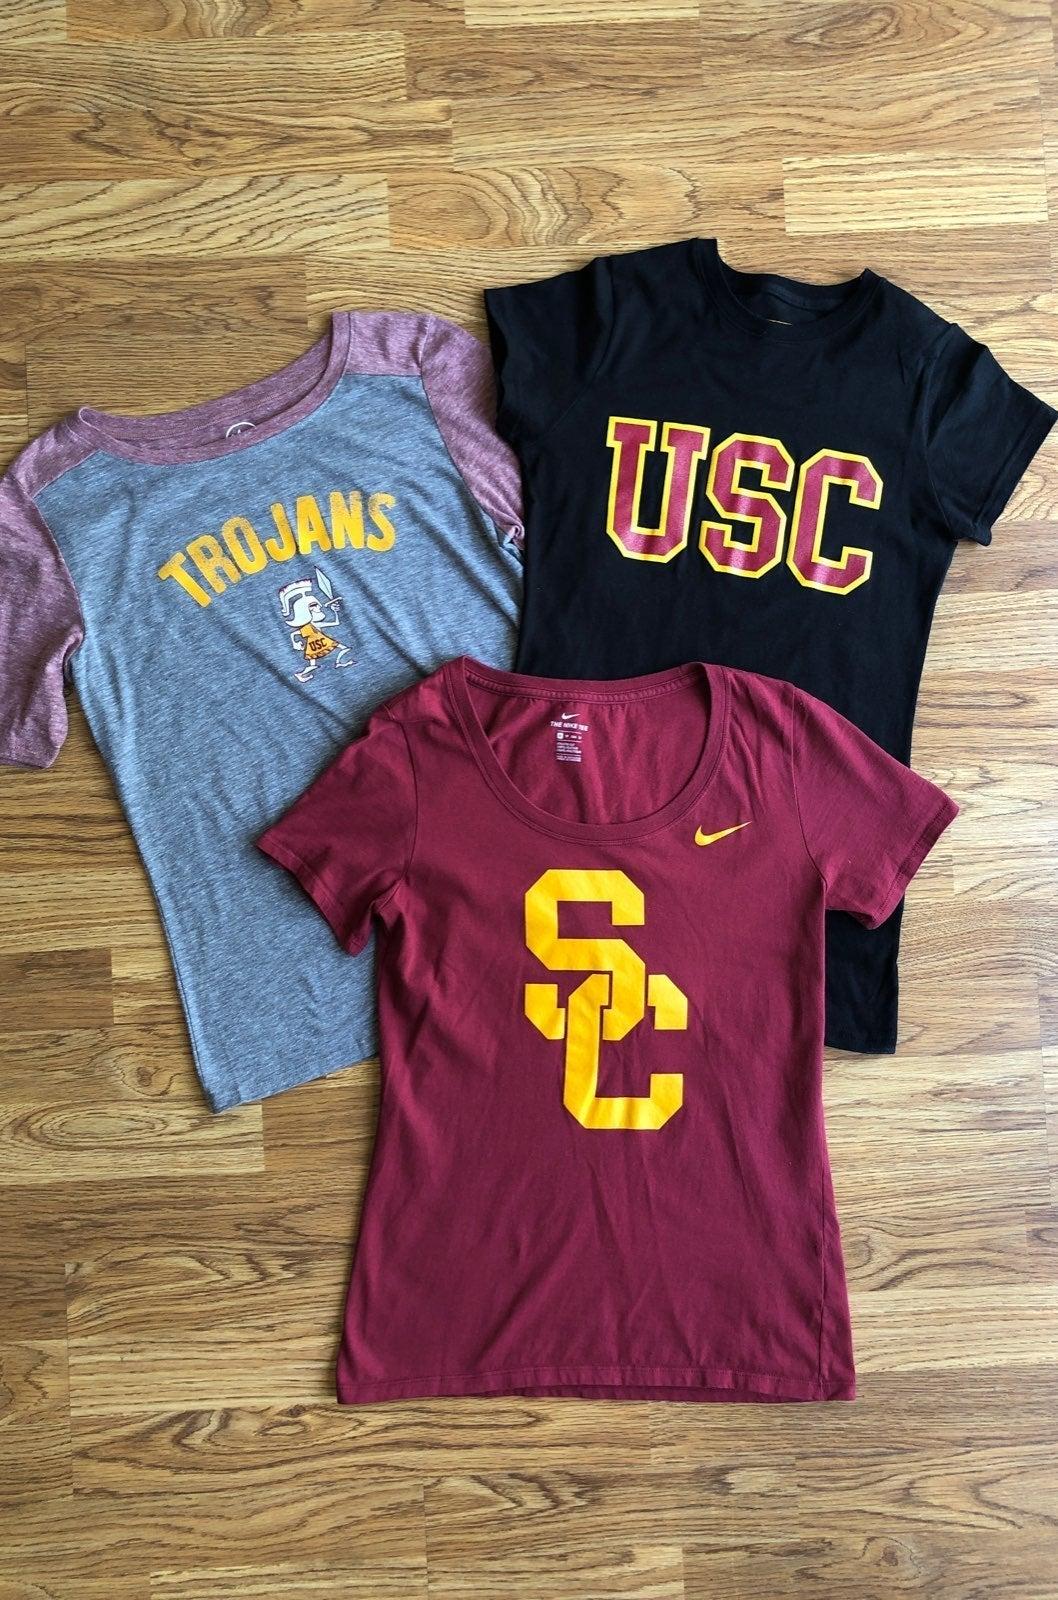 3 NEW USC Trojan Shirts XS/S Bundle